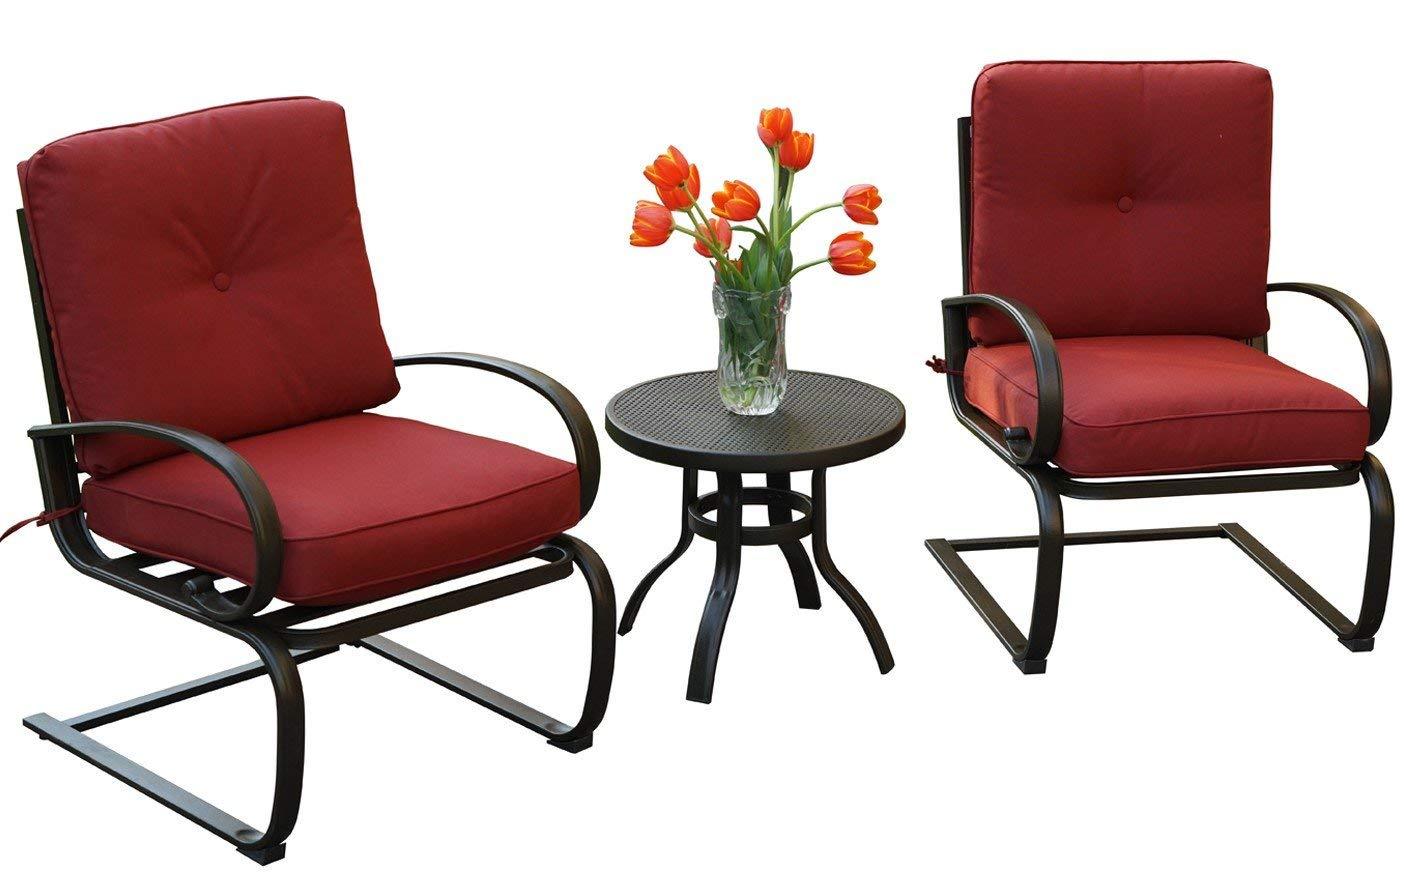 Kozyard Susan 3 PCs Patio Bistro Set Outdoor Furniture Patio, Garden Yard Cushioned Seats(Burgundy)